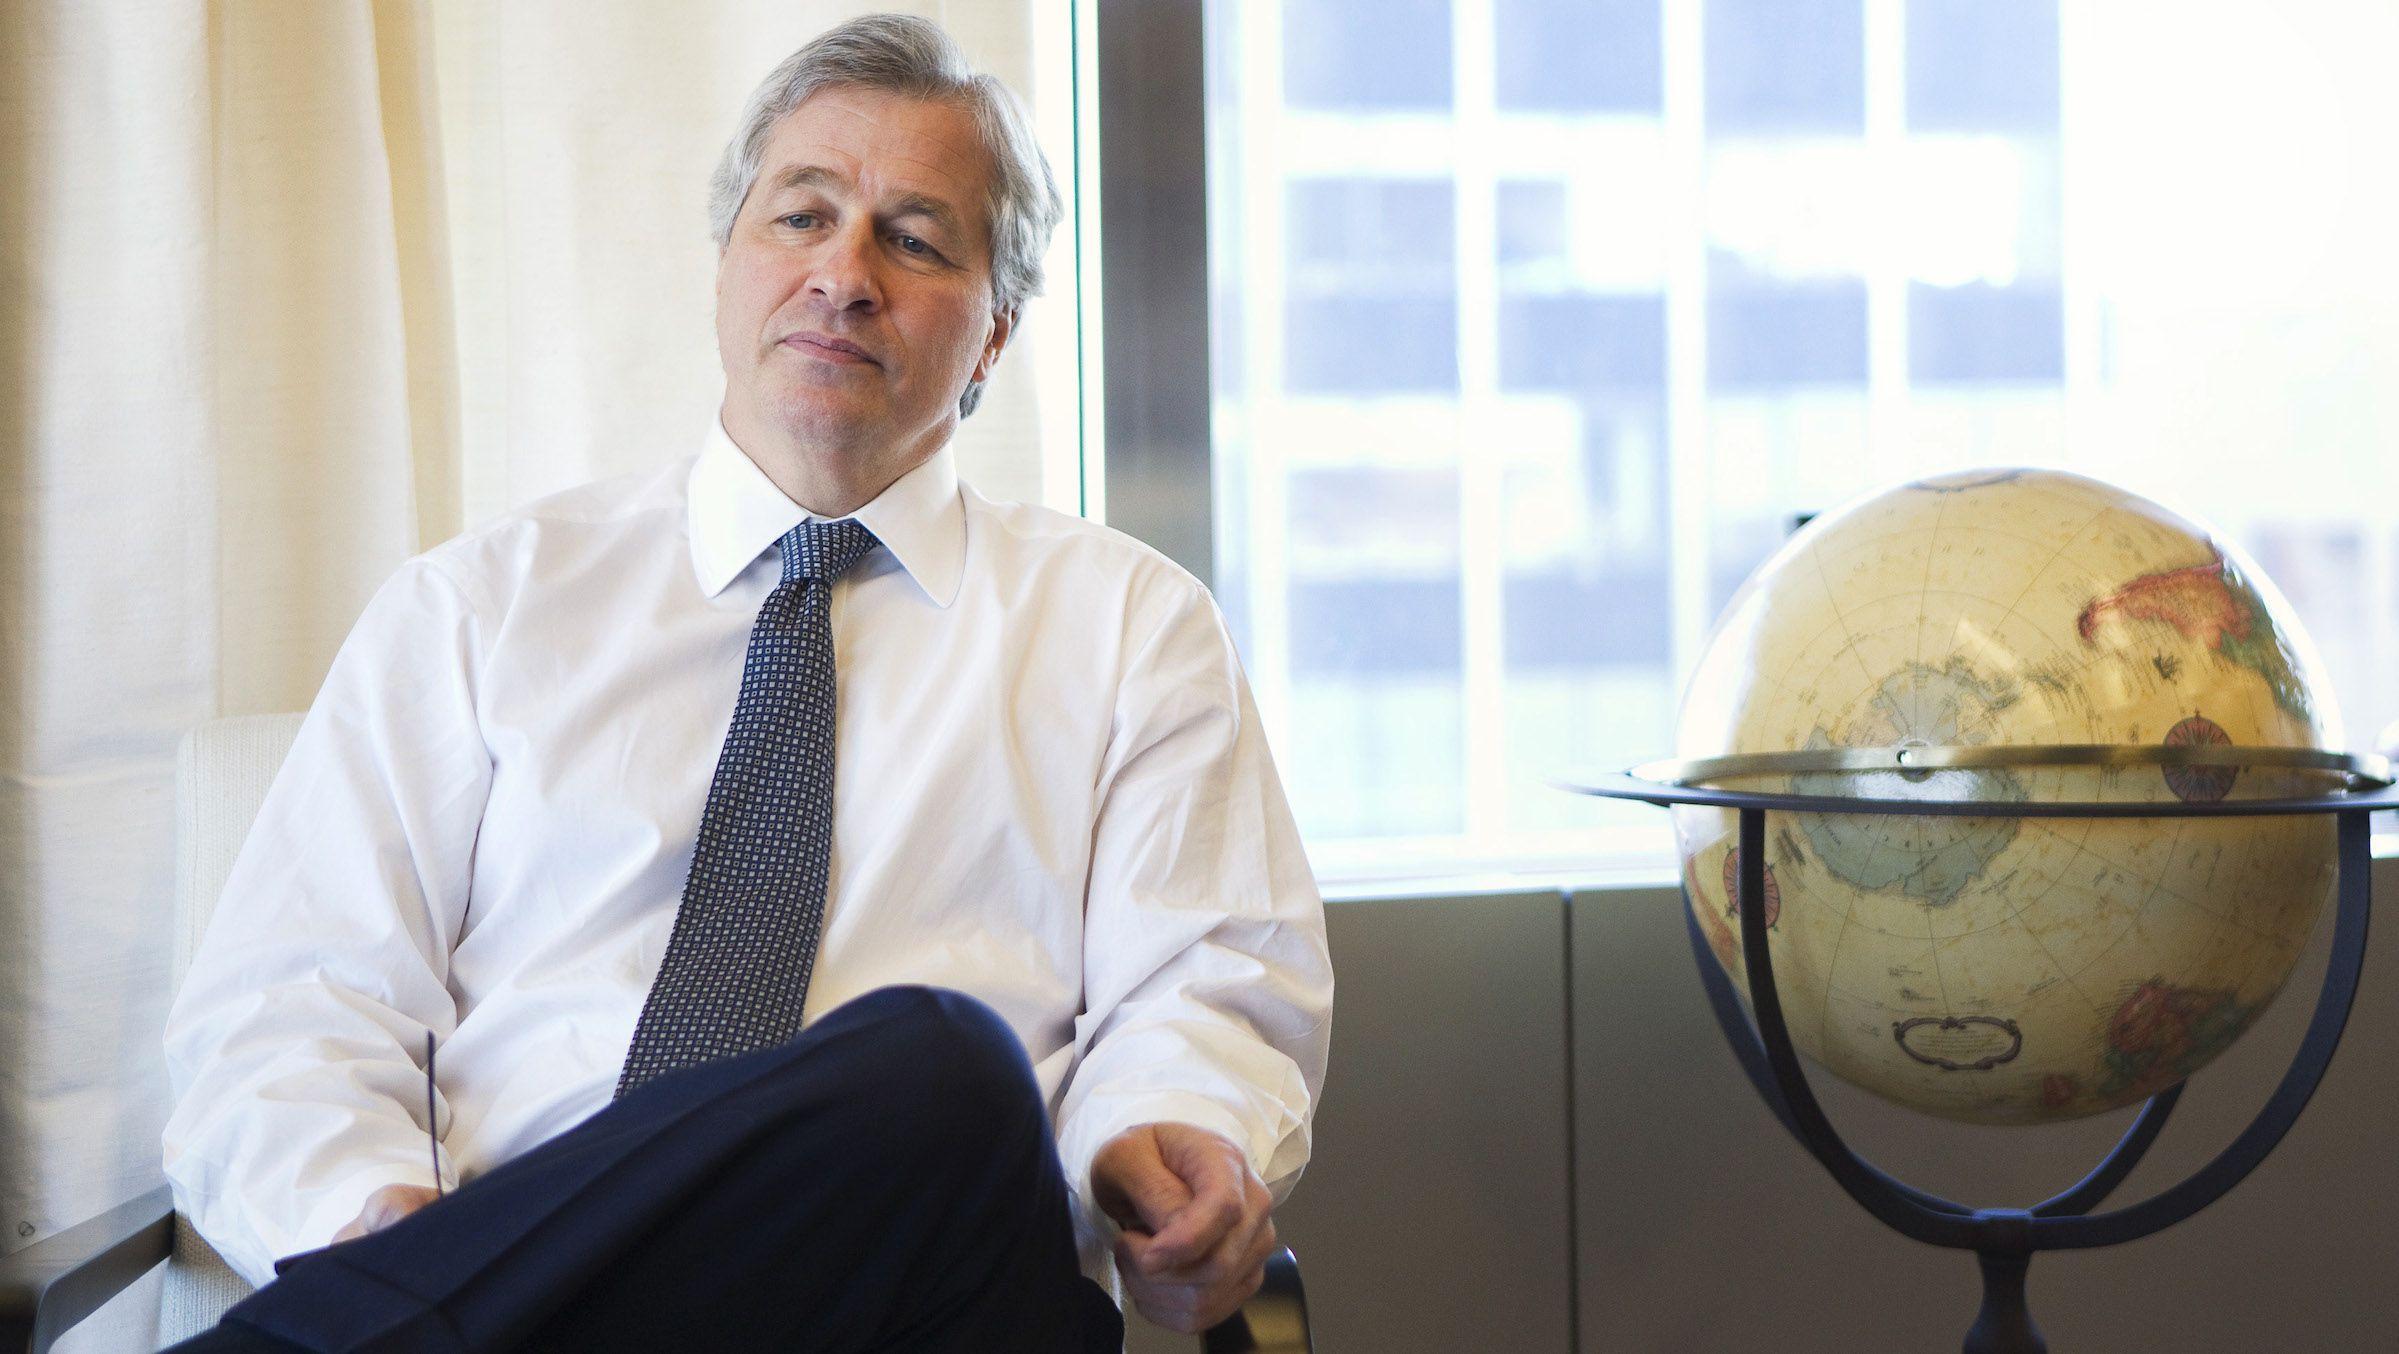 Jamie Dimon's cancer news spotlights JPMorgan's management bench